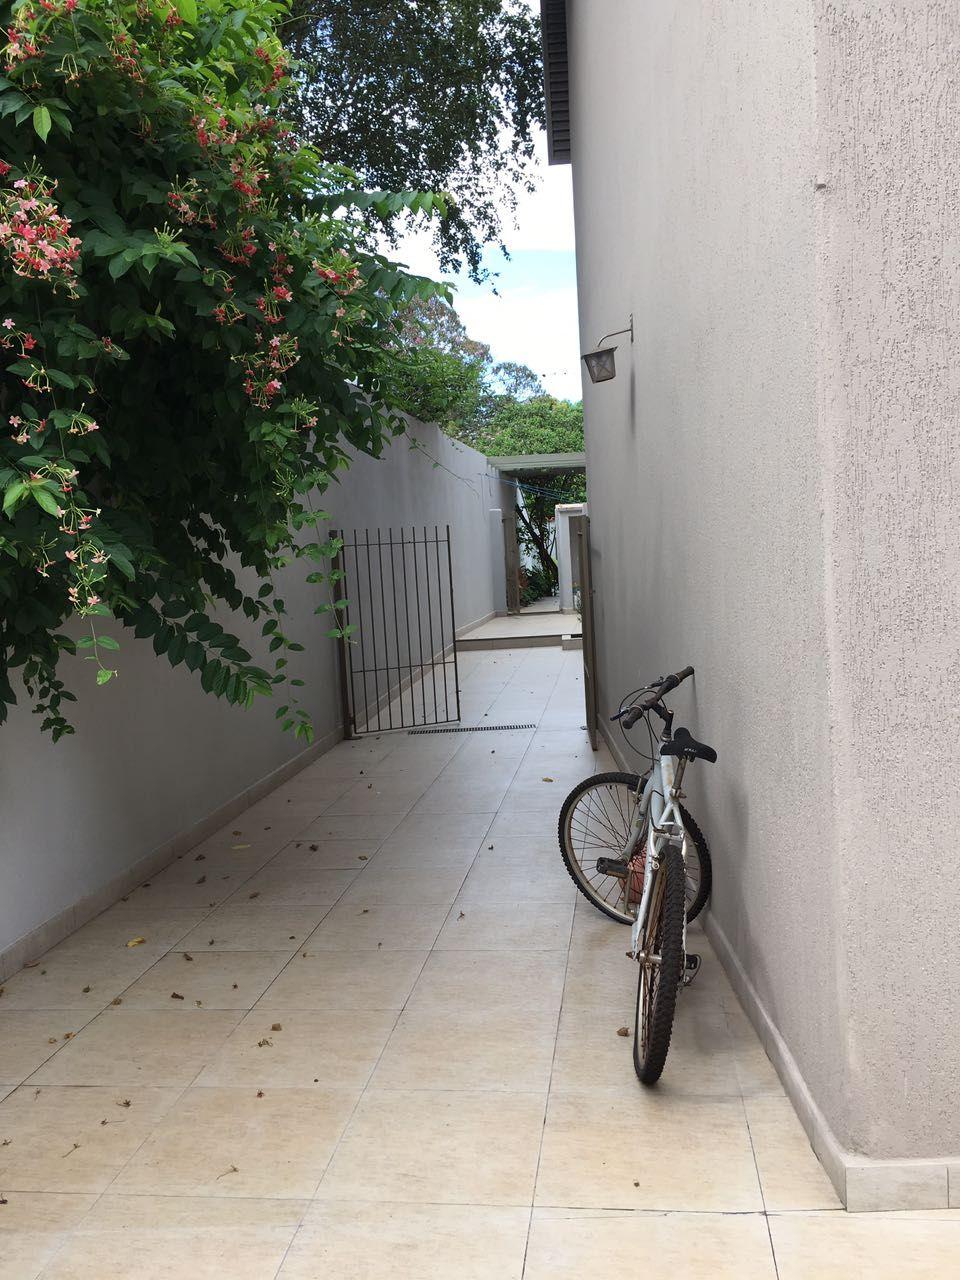 278 - Casa Jardim Recreio 450 m²